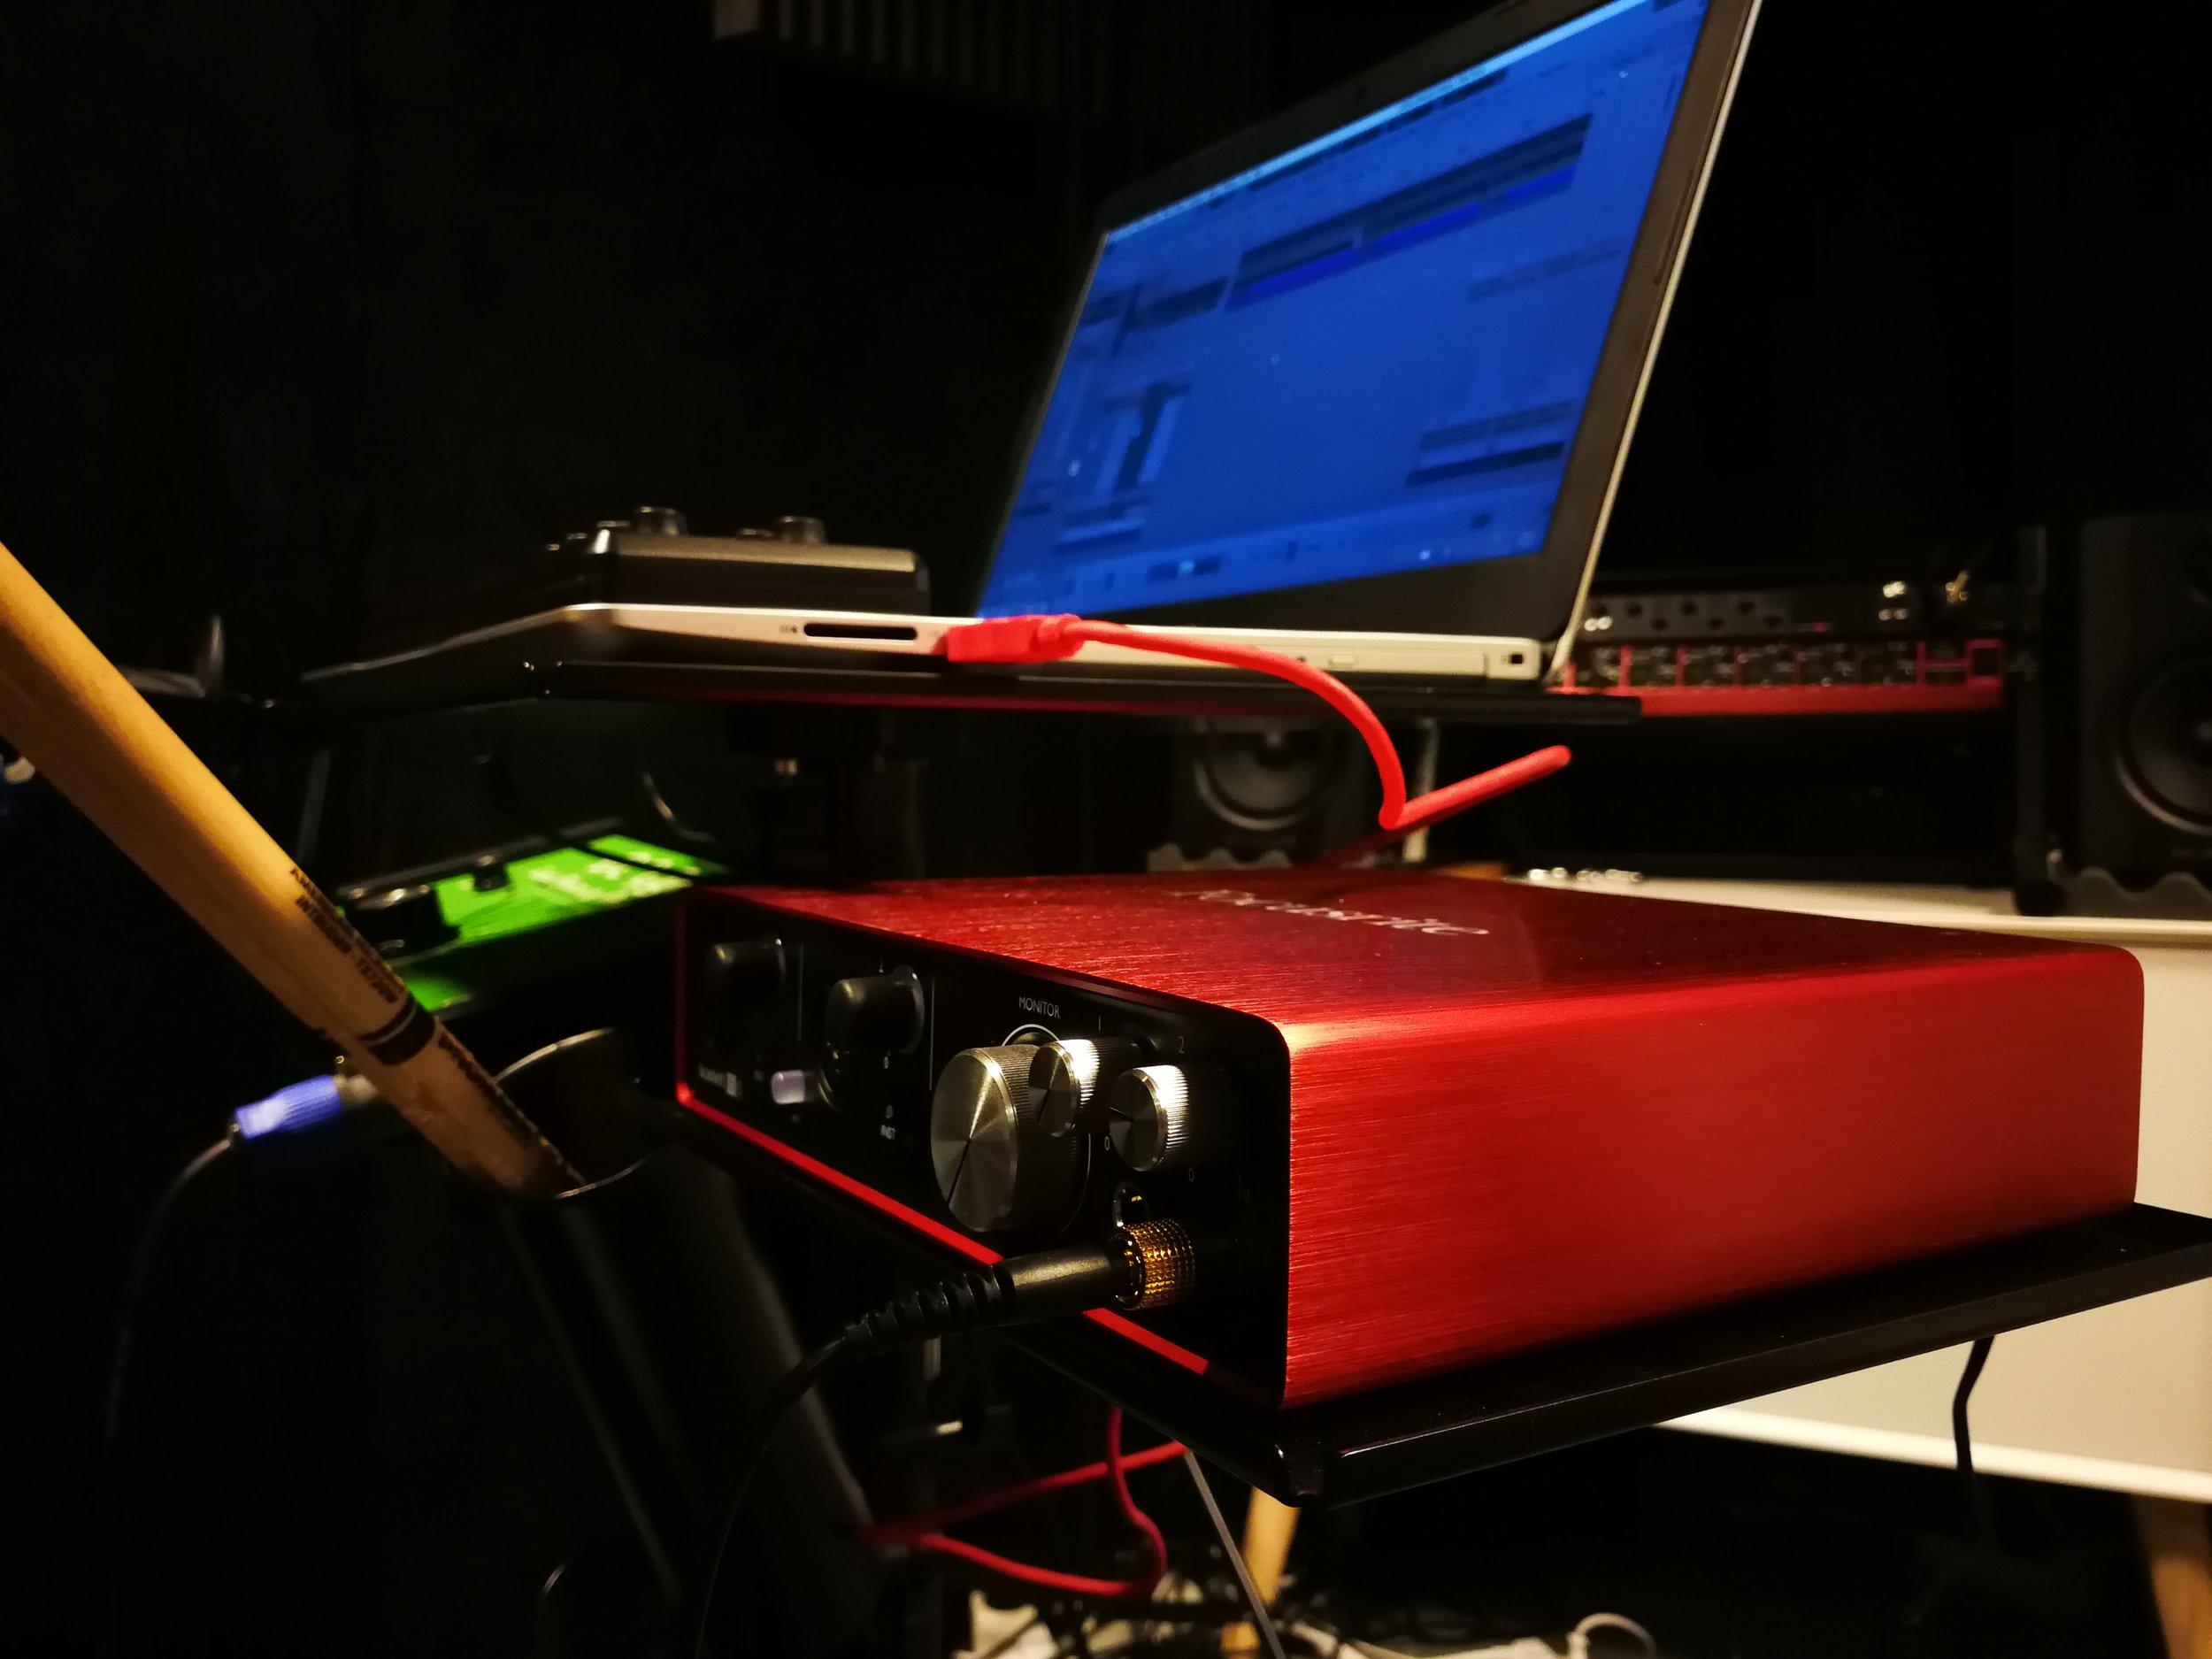 Focusrite Scarlett 6i6 audio interface.